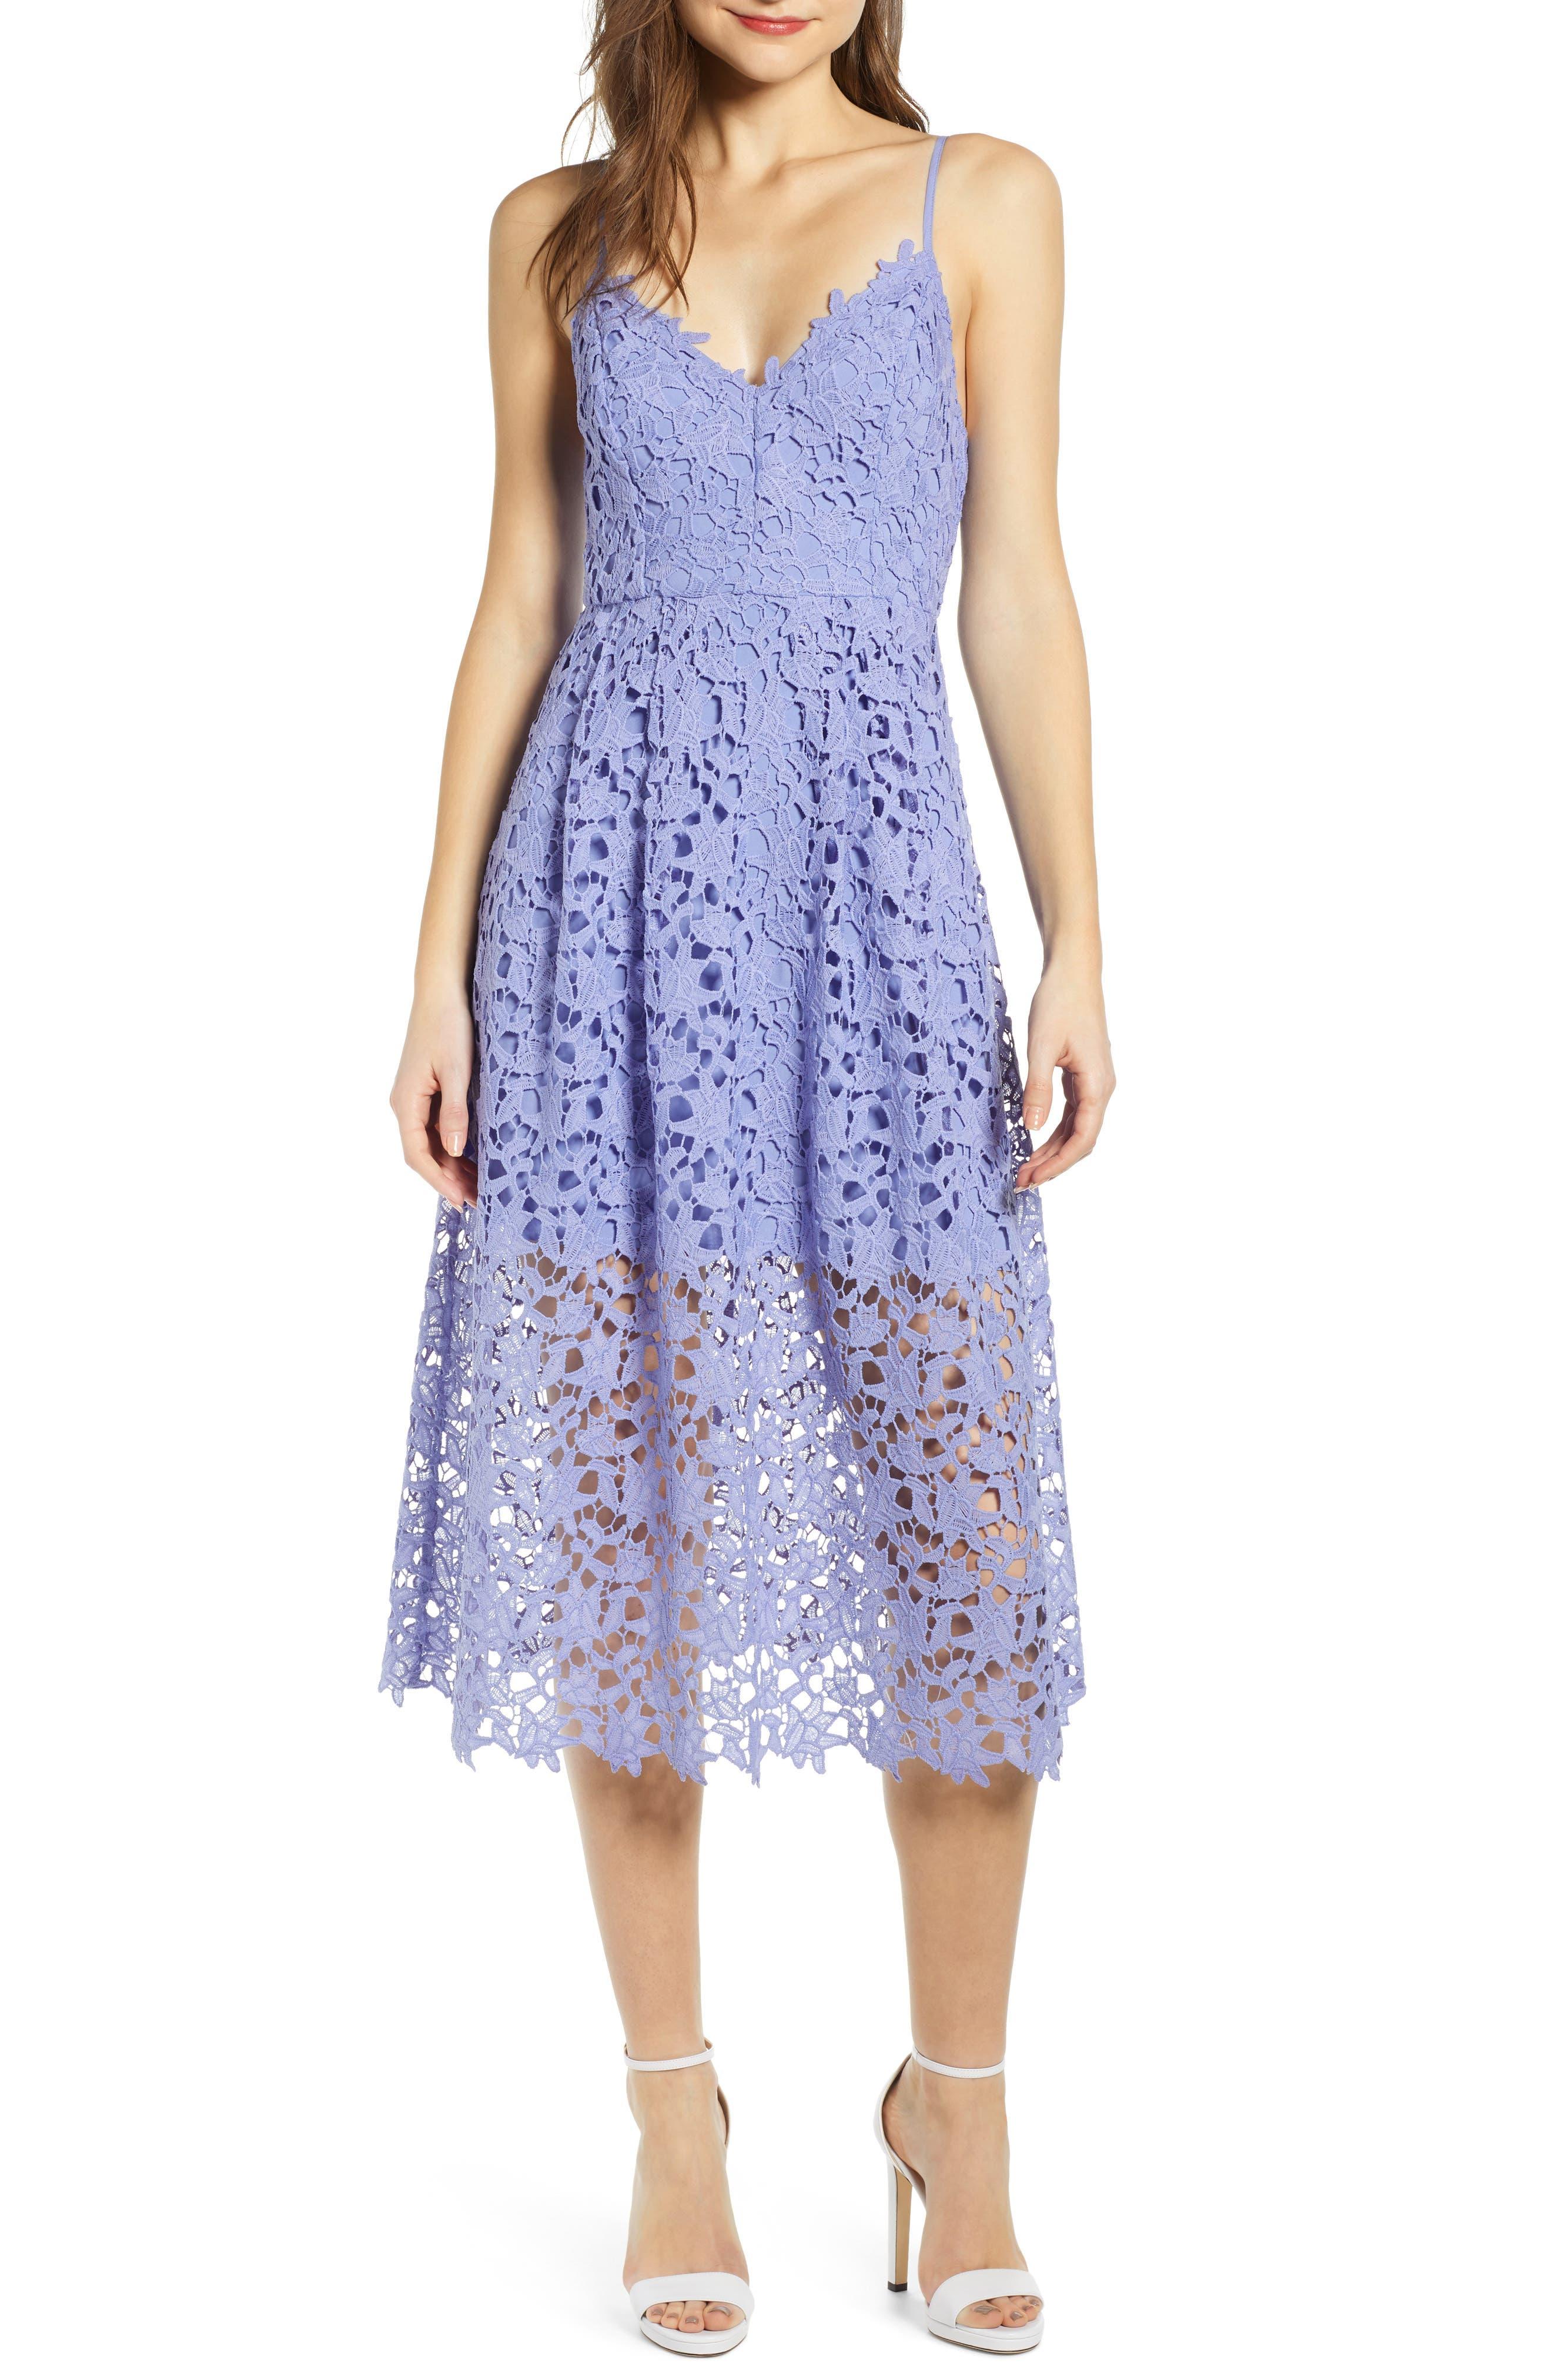 ASTR THE LABEL,                             Lace Midi Dress,                             Main thumbnail 1, color,                             LAVENDER